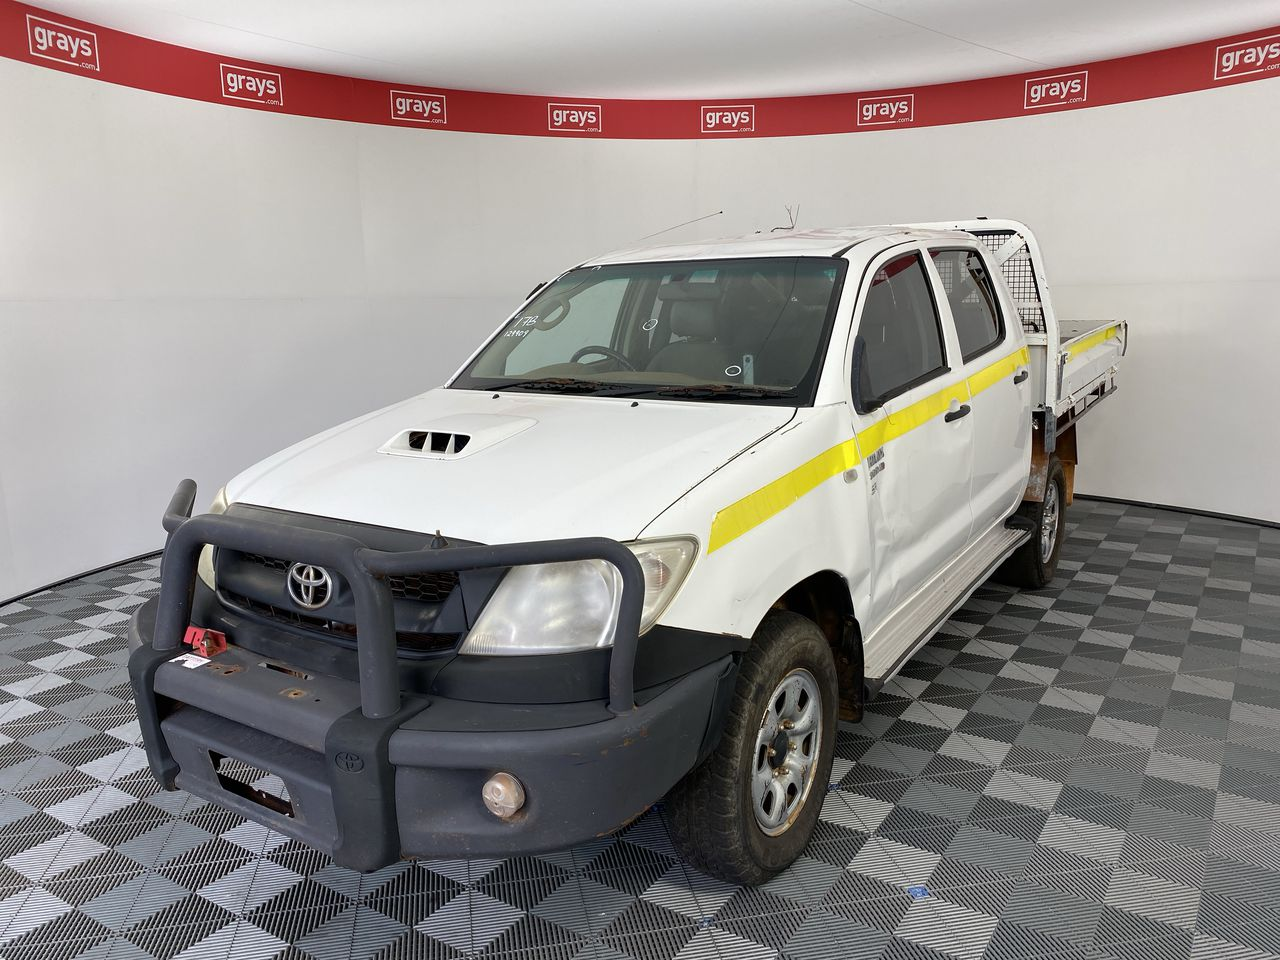 2010 Toyota Hilux SR 4x4 KUN26R T/Dsl Manual C/Cab Chassis (WOVR-Statutory)